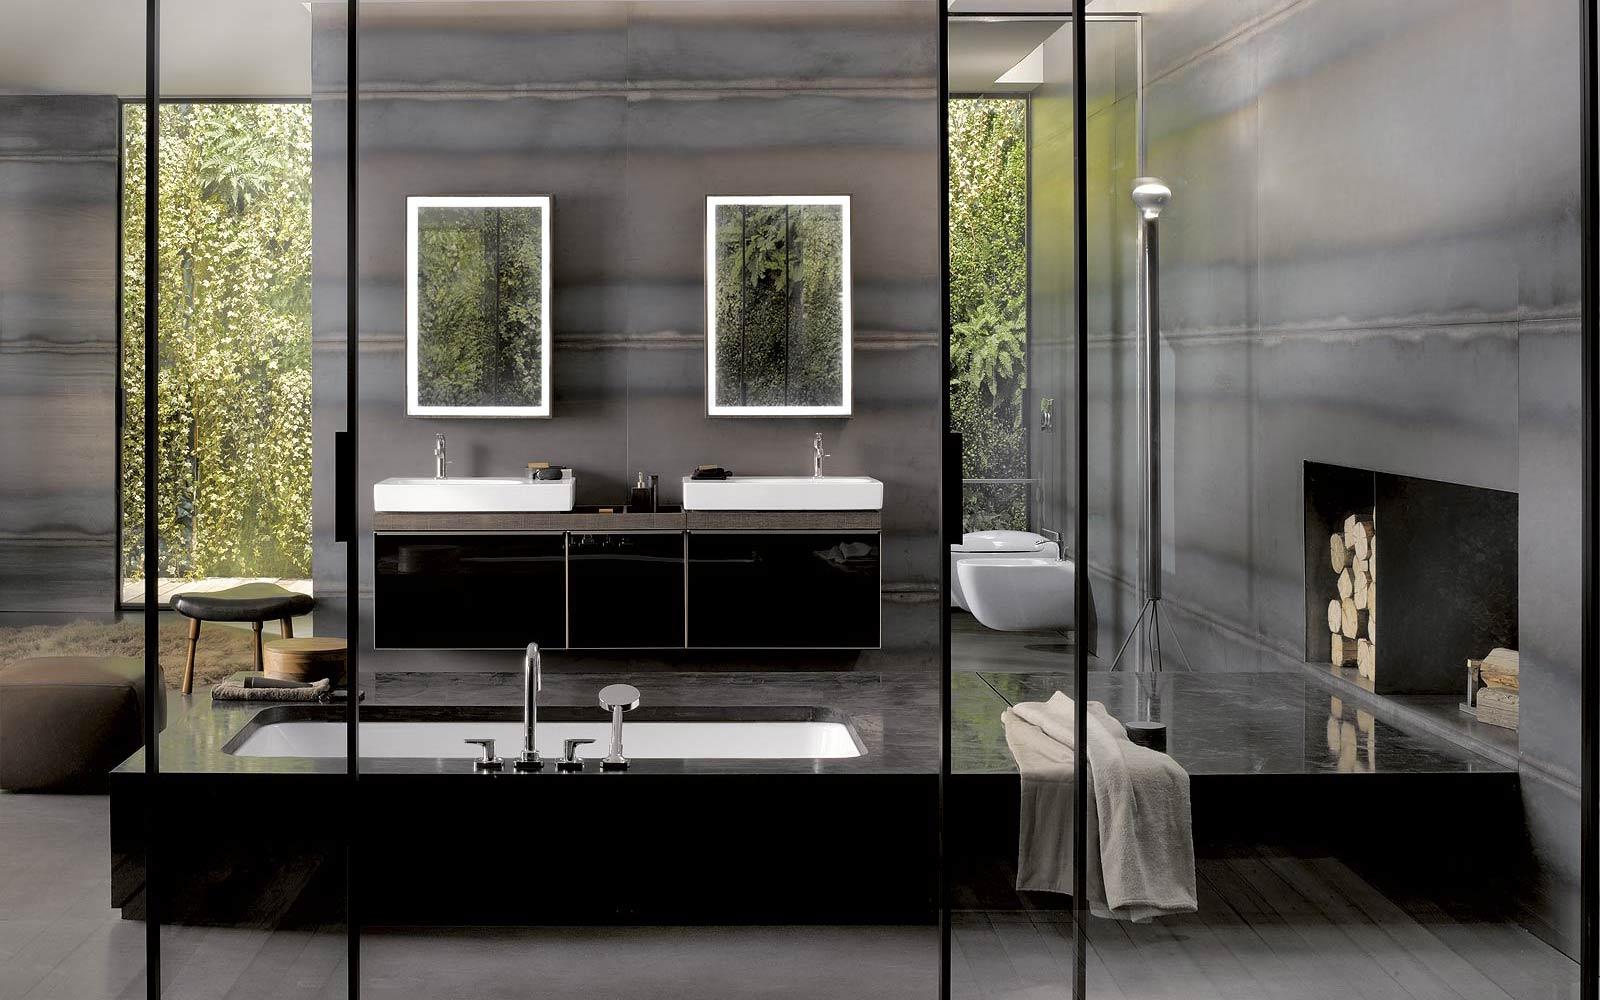 Amazing Salle De Bain De Luxe Design Idees Photos Et Id Es